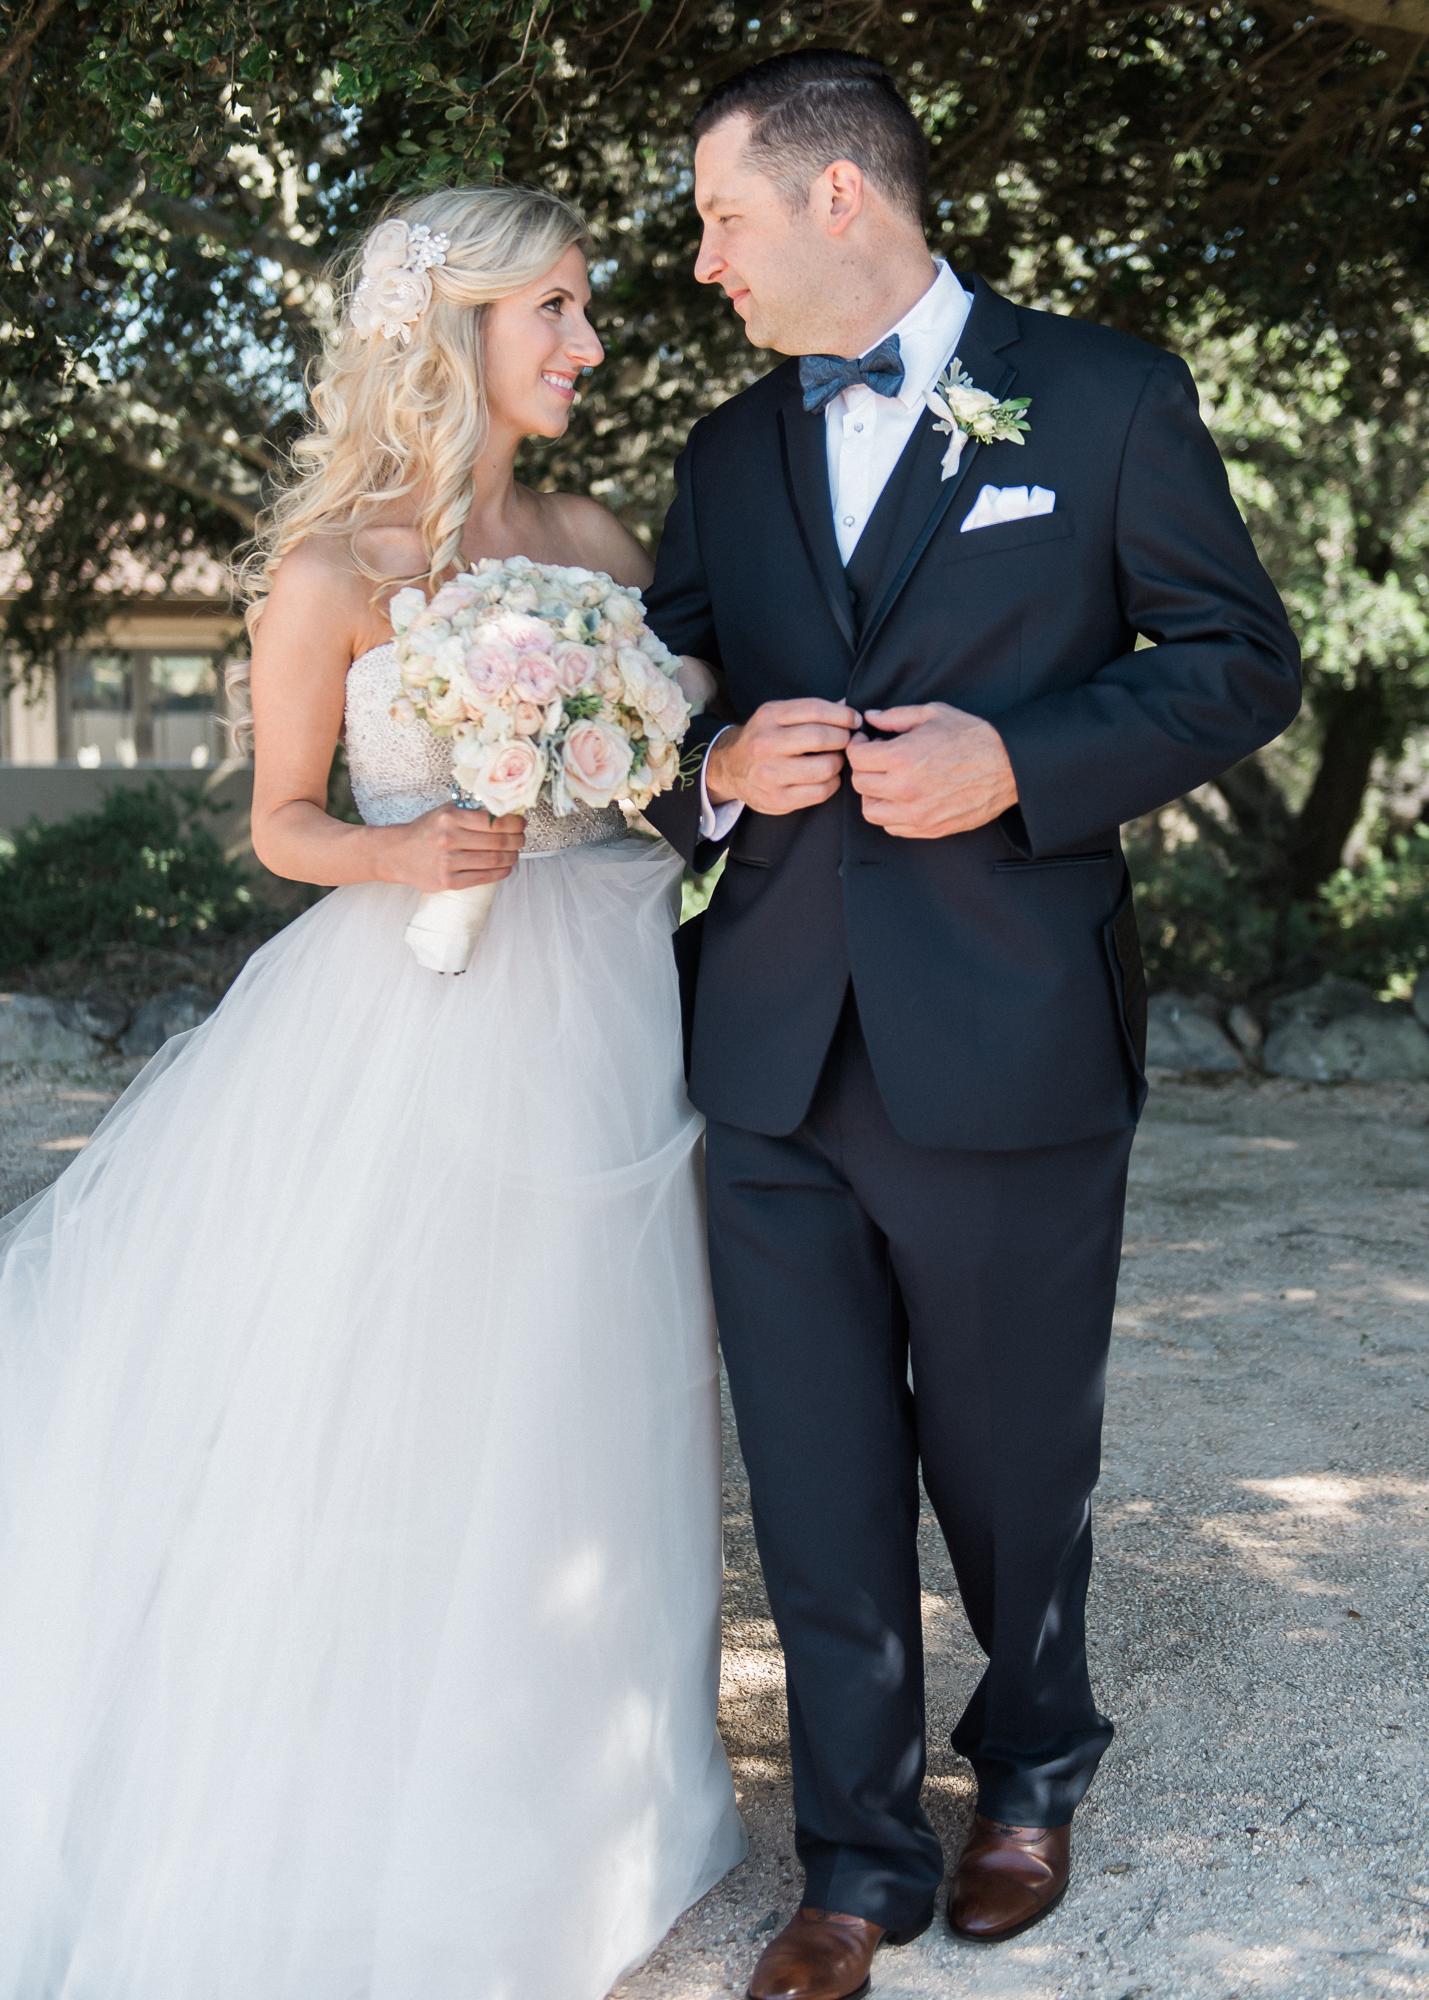 Aimee+Logan_wedding_spp-45.jpg